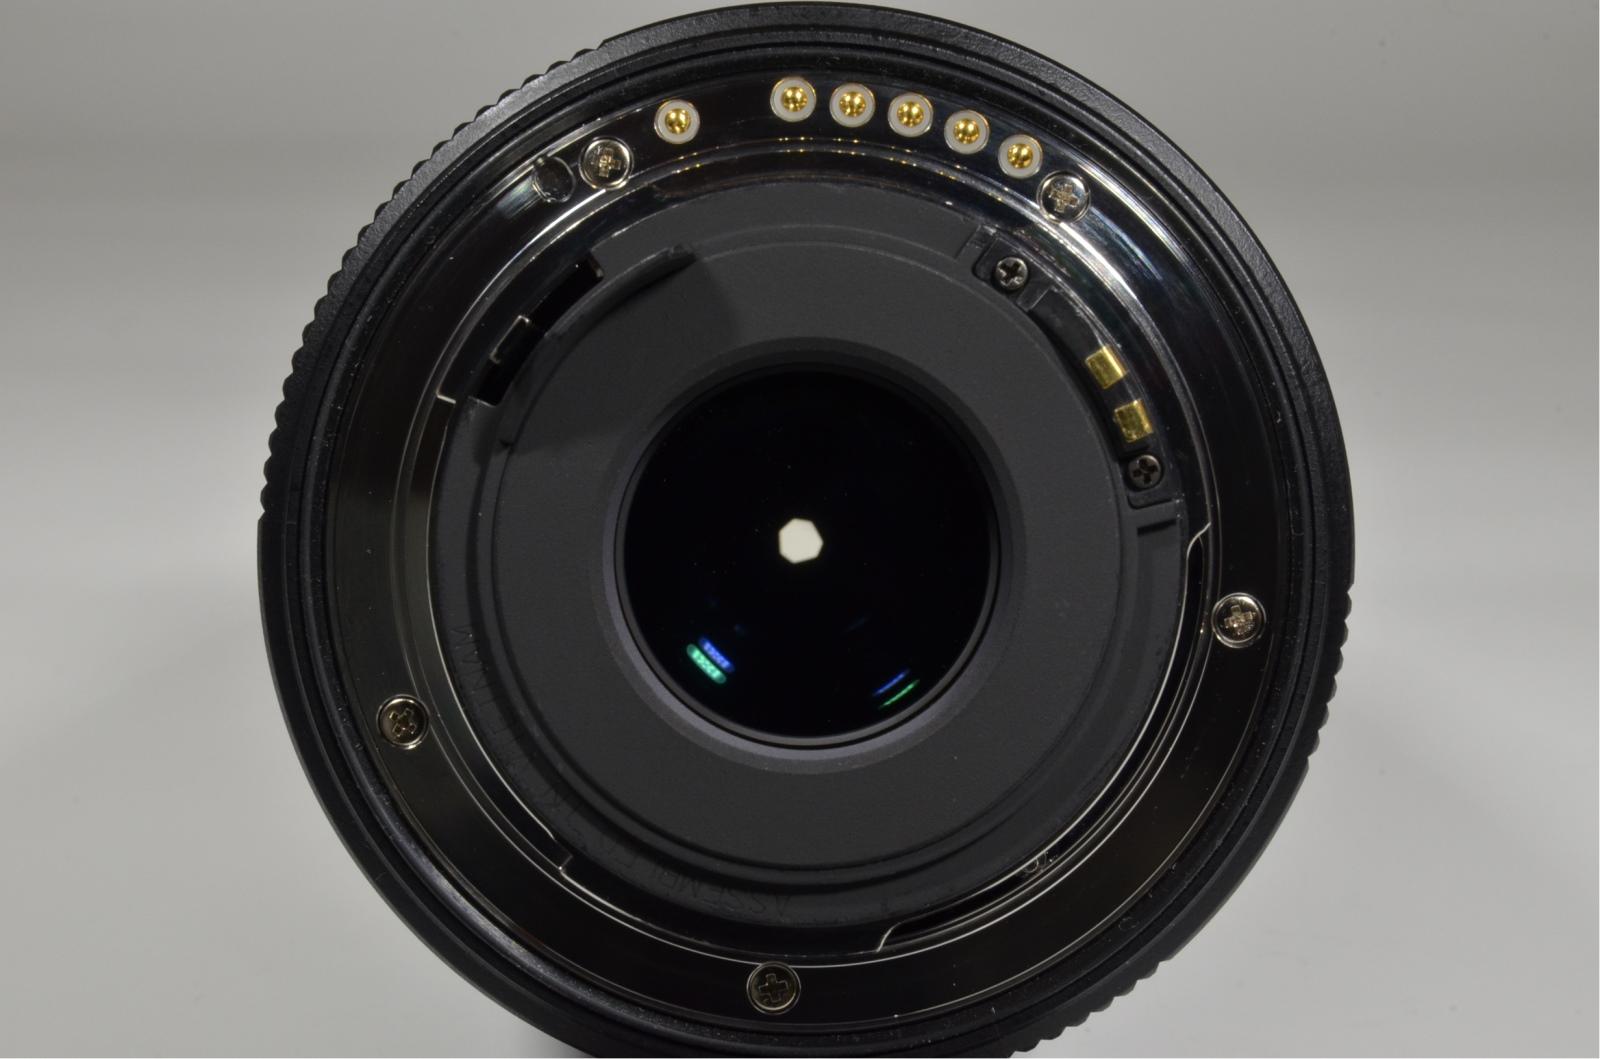 pentax smc da 17-70 mm f4 sdm if al